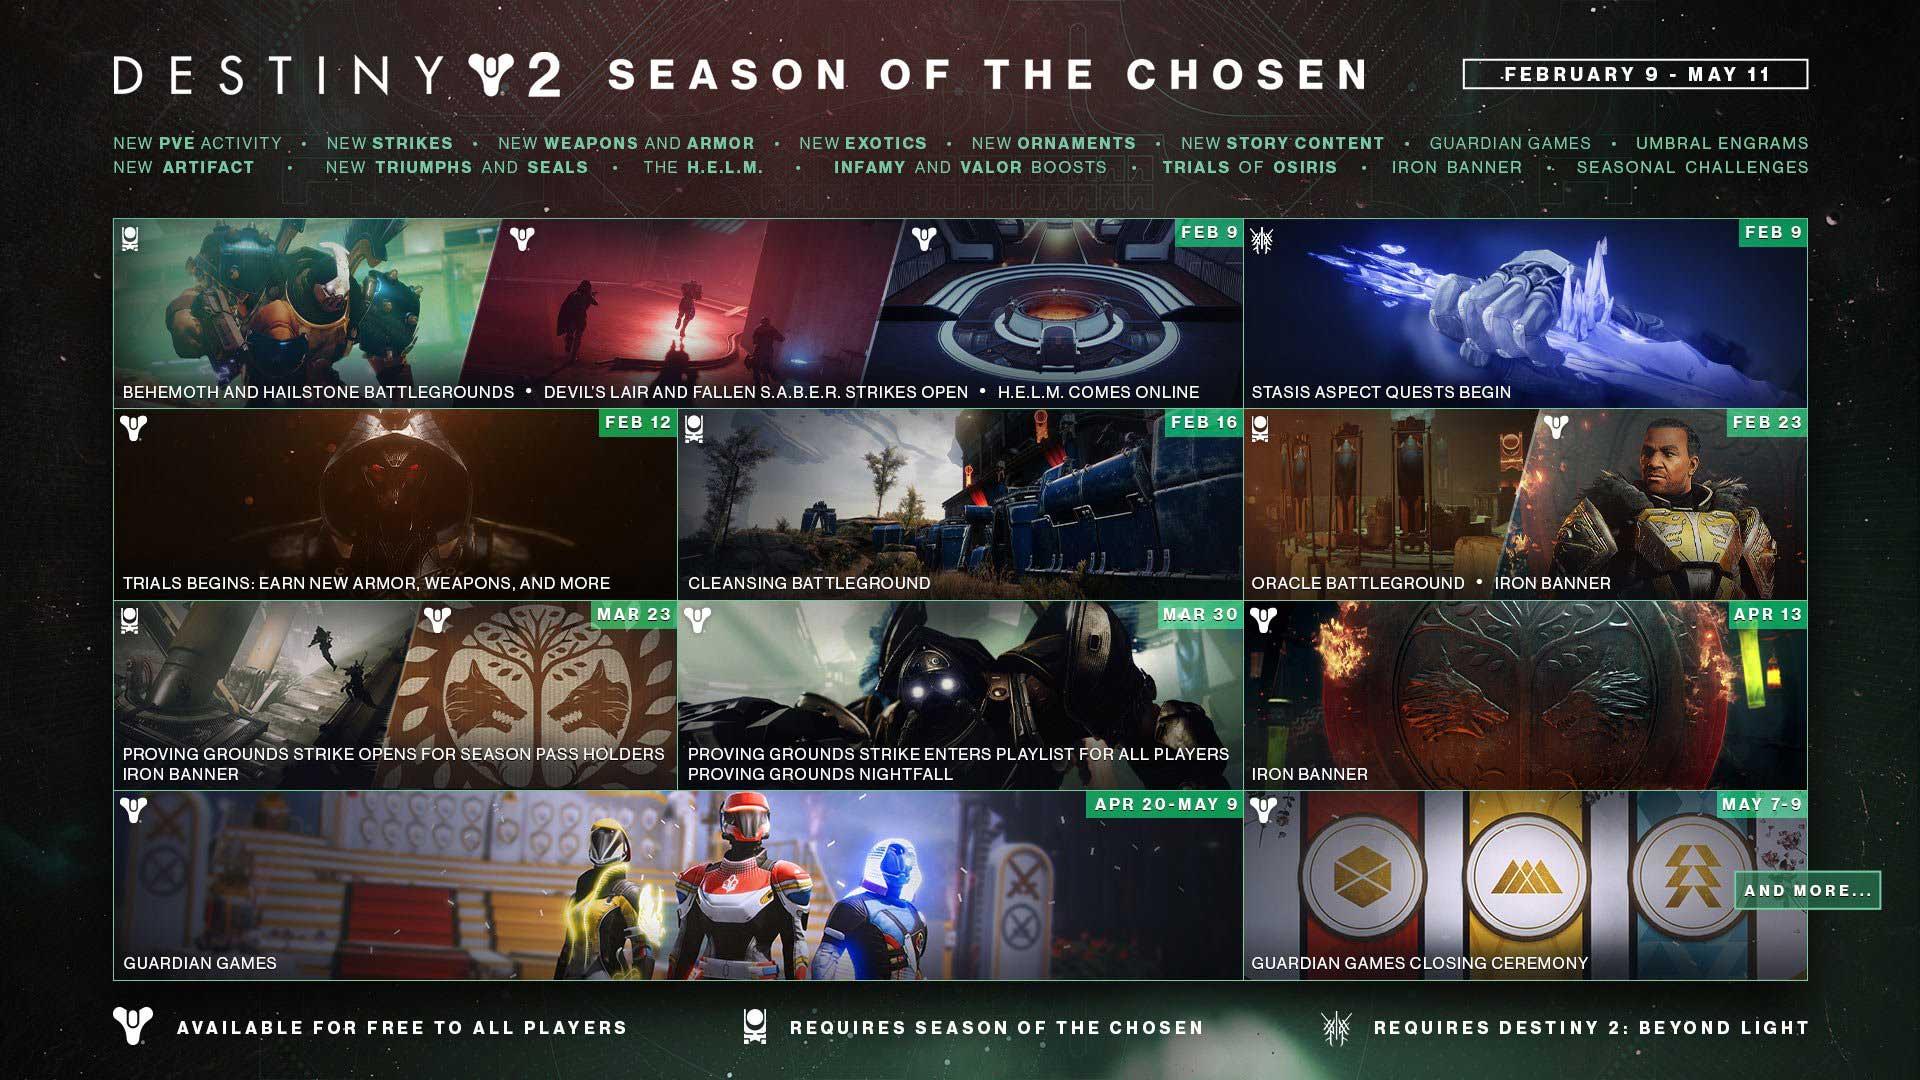 Destiny 2 Season of Chosen